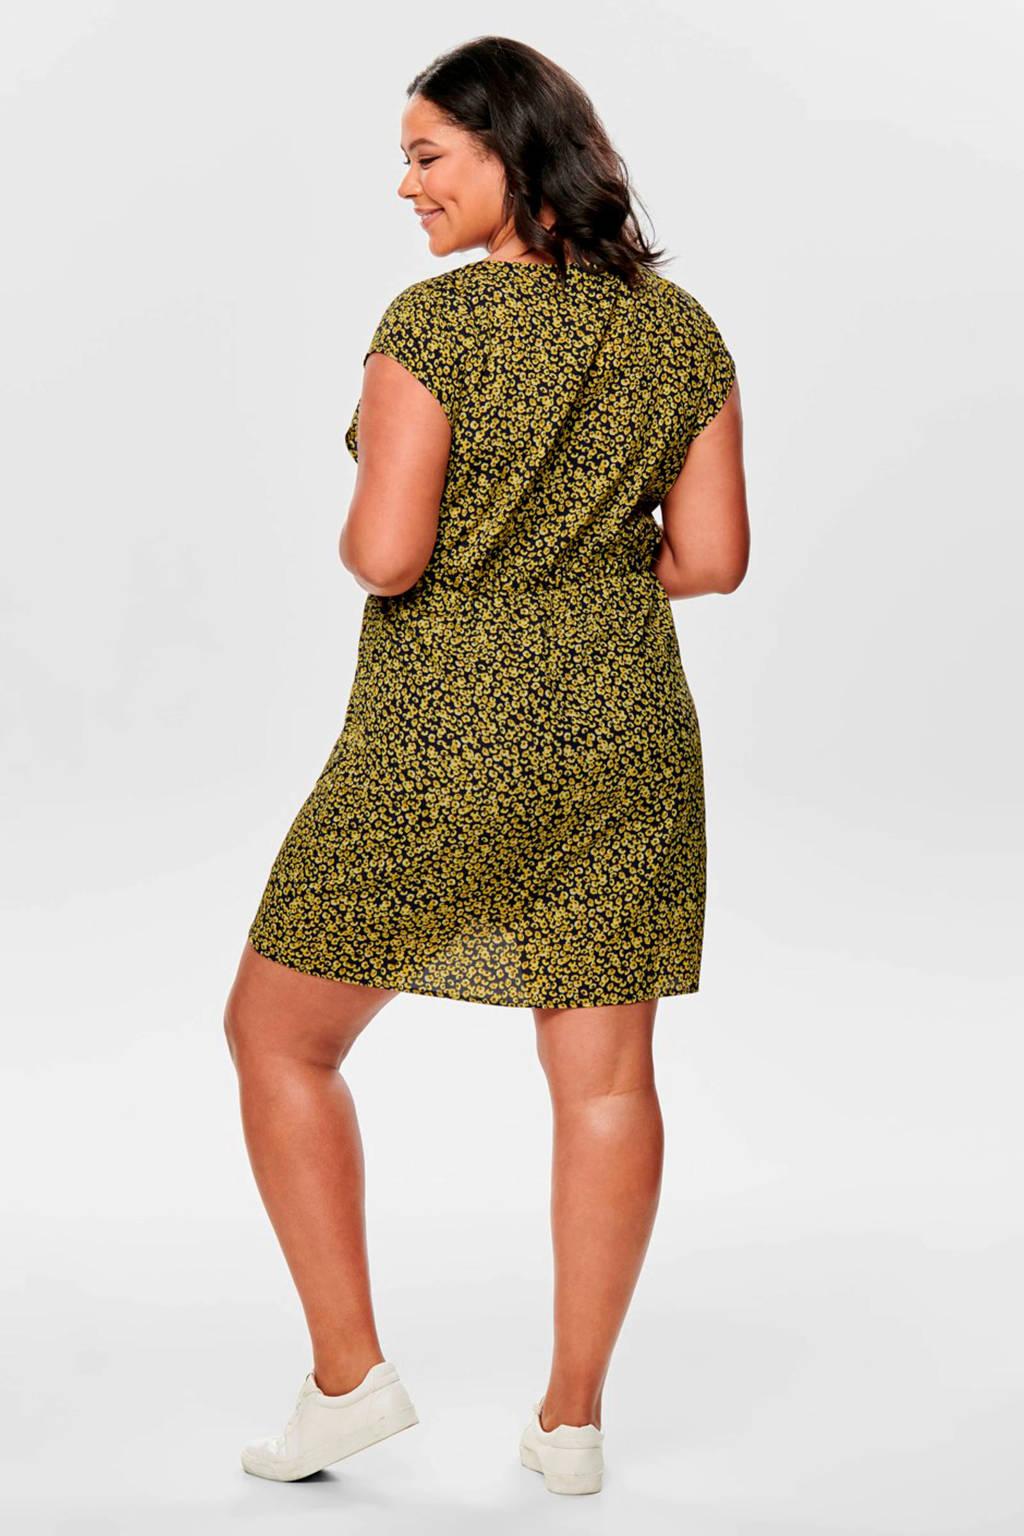 ONLY carmakoma jurk met all over print geel, Geel/zwart